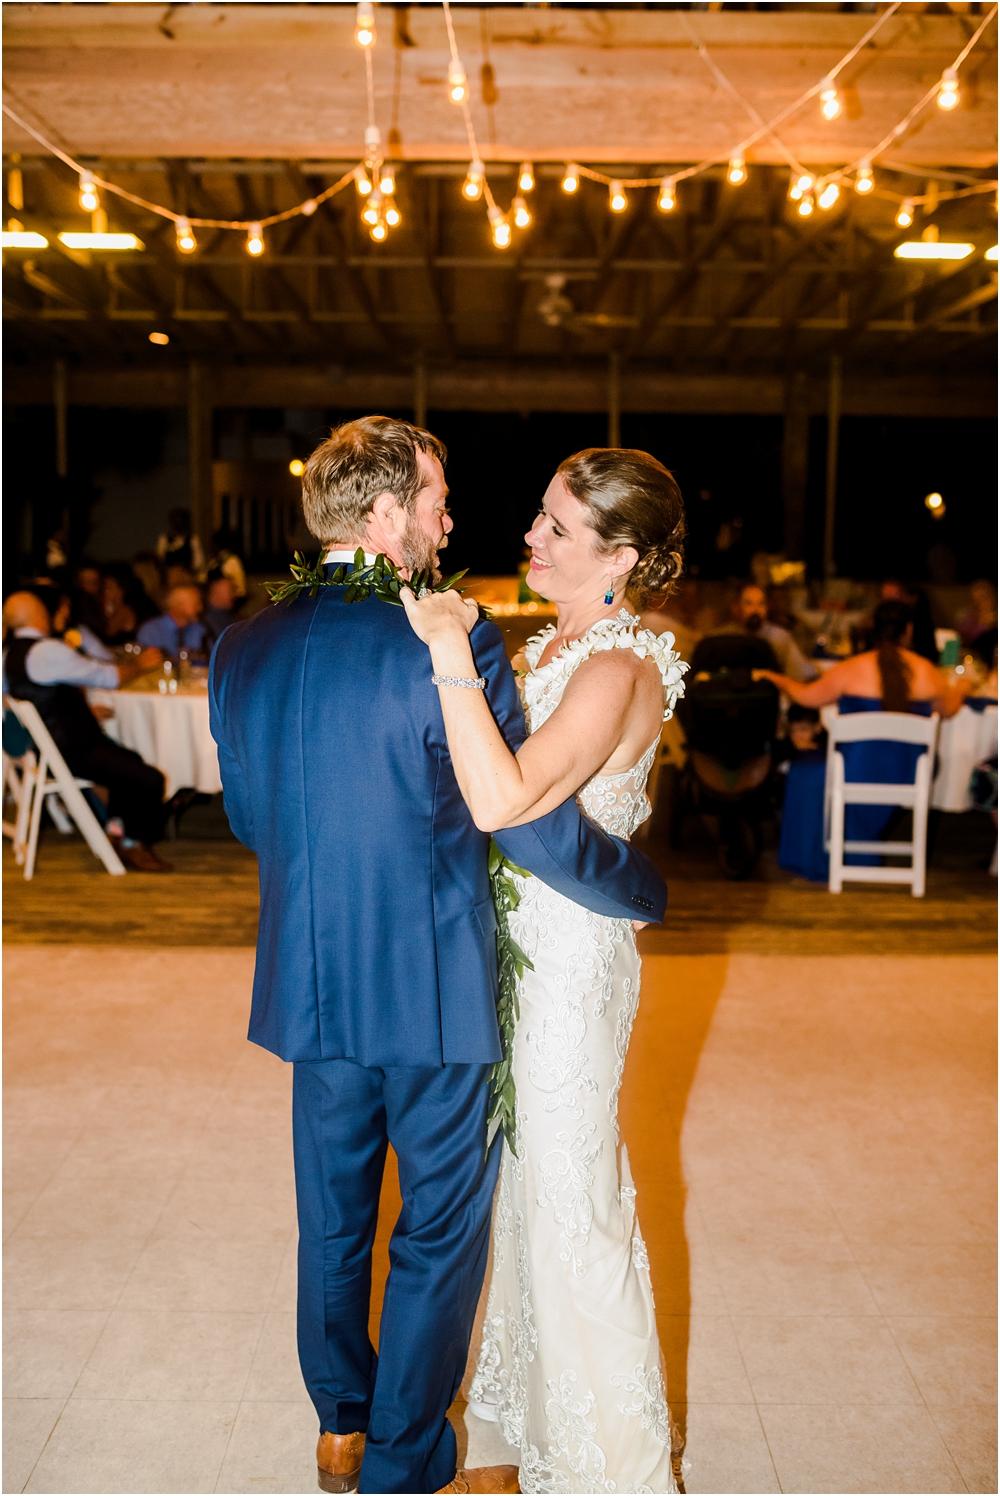 ledman-wedding-kiersten-stevenson-photography-30a-panama-city-beach-dothan-tallahassee-(619-of-763).JPG